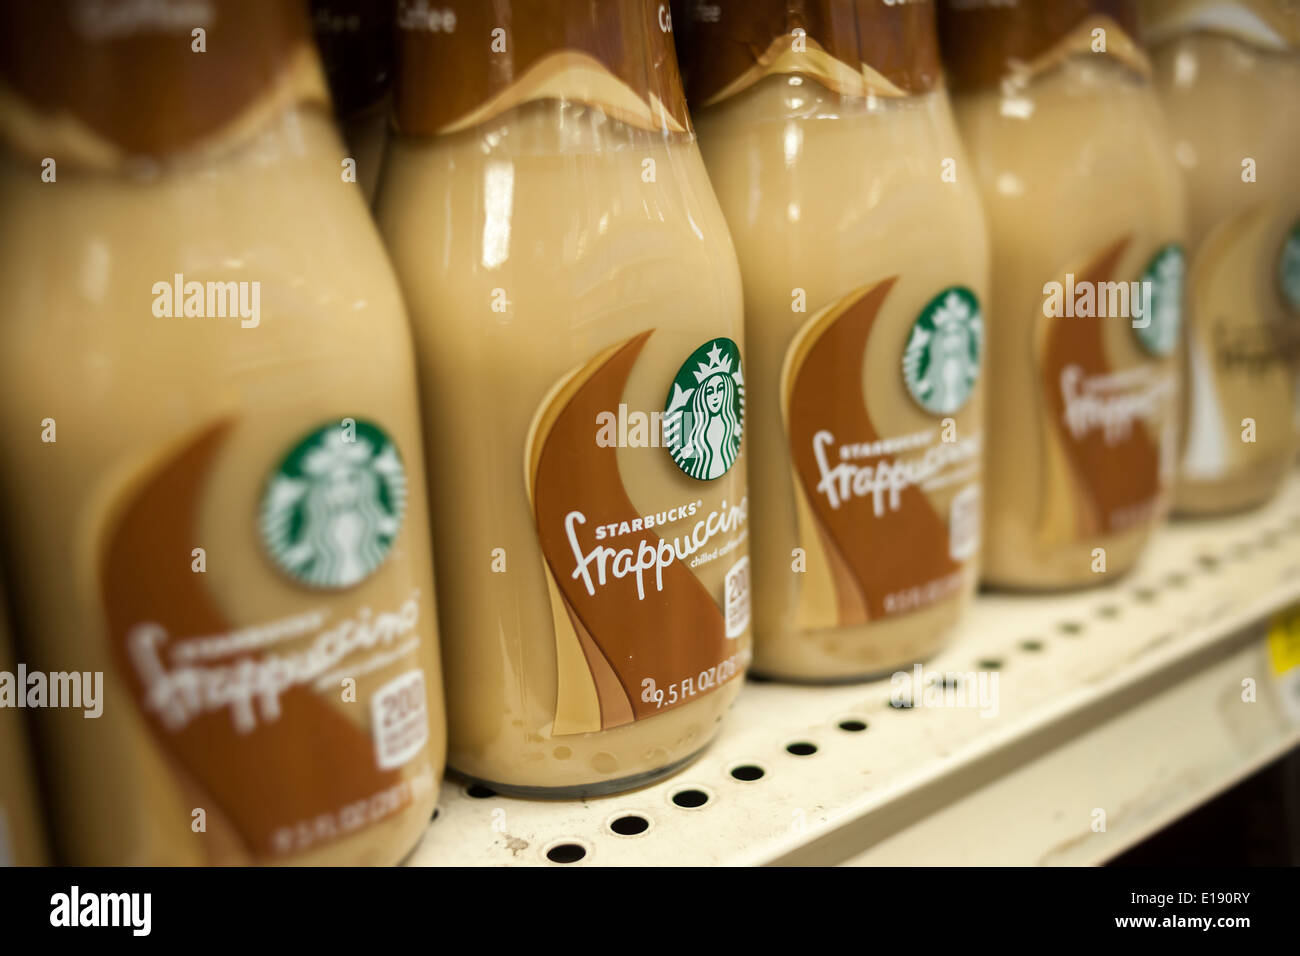 Starbucks Frappuccino Stock Photos & Starbucks Frappuccino Stock ...